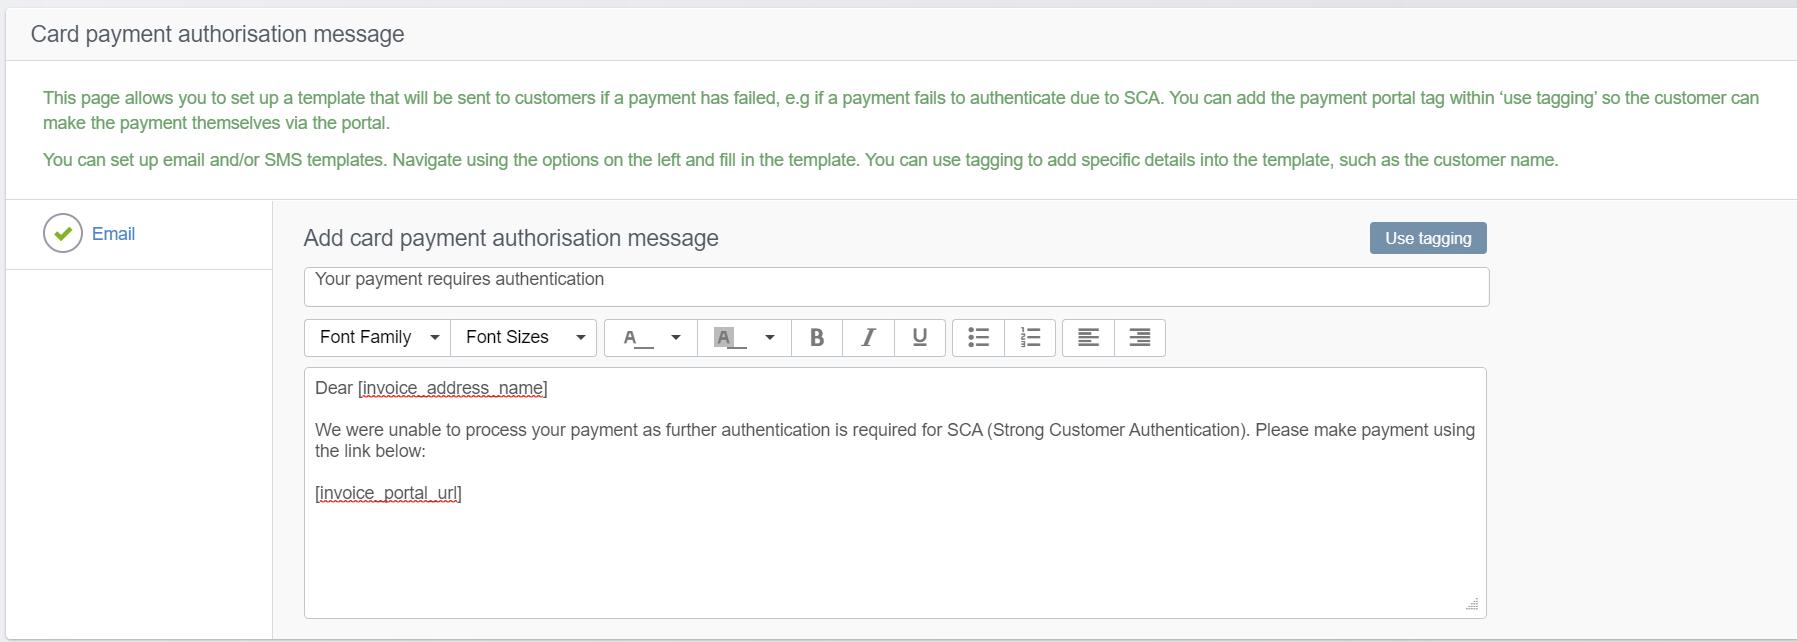 Card oayment authorisation message